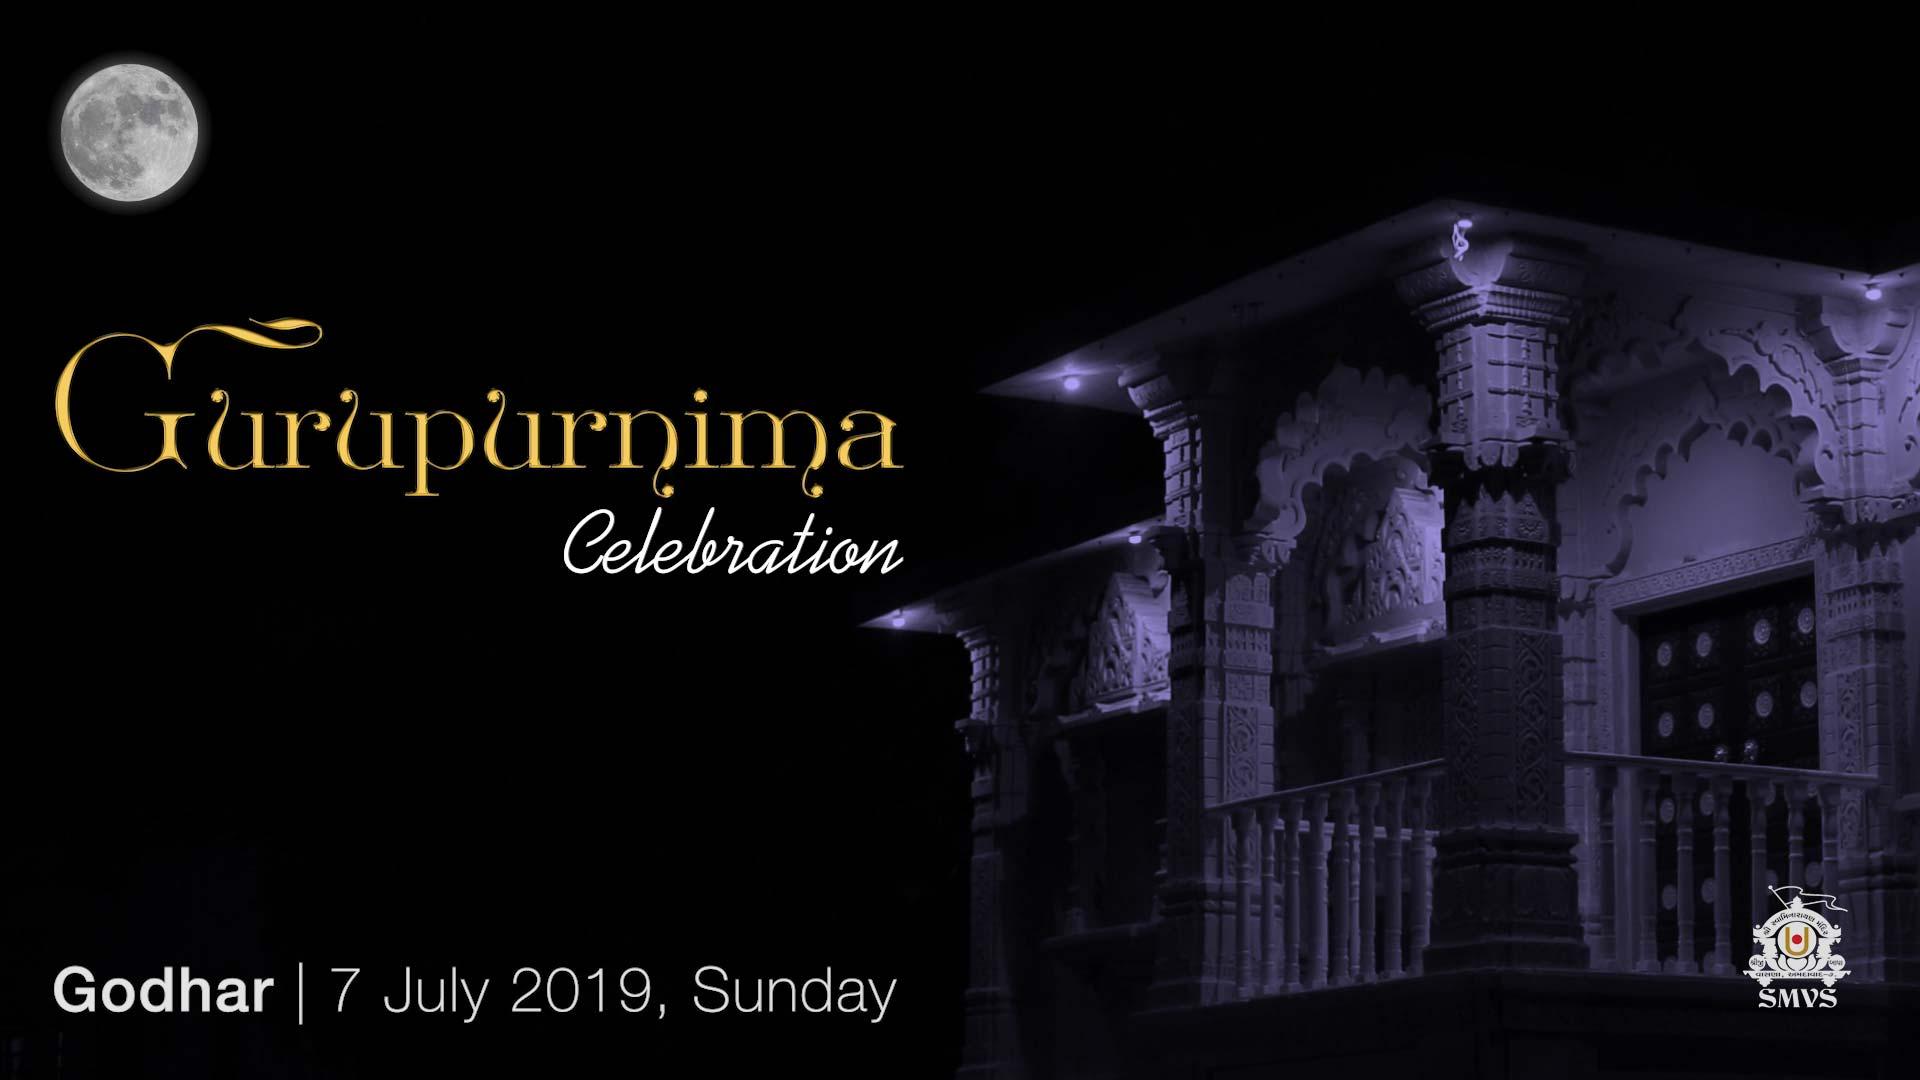 Guru Purnima Celebration 2019 - Godhar